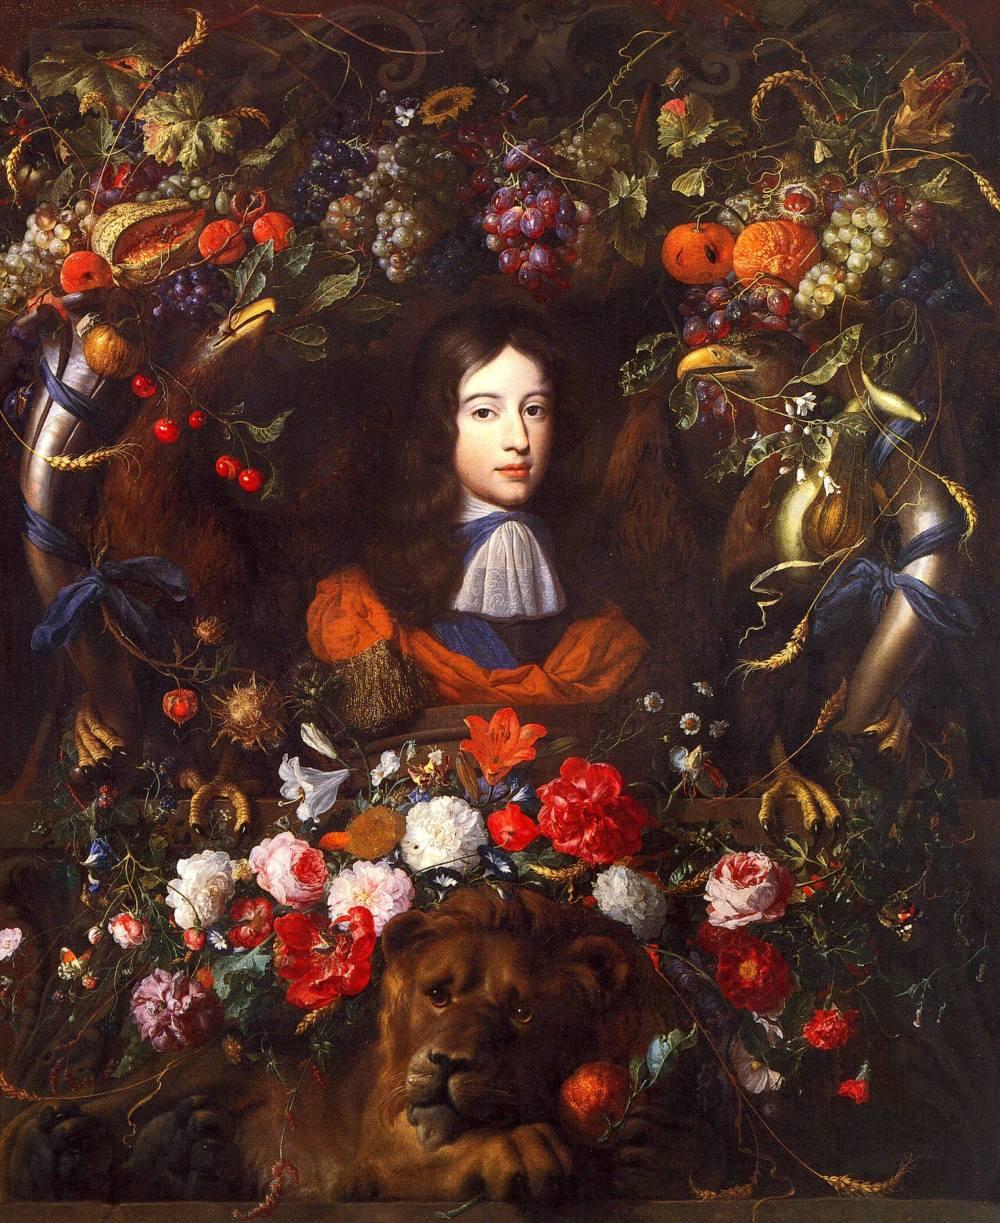 Jan_davids_de_heem-fleurs_avec_portrait_guillaume_III_d'Orange.jpg